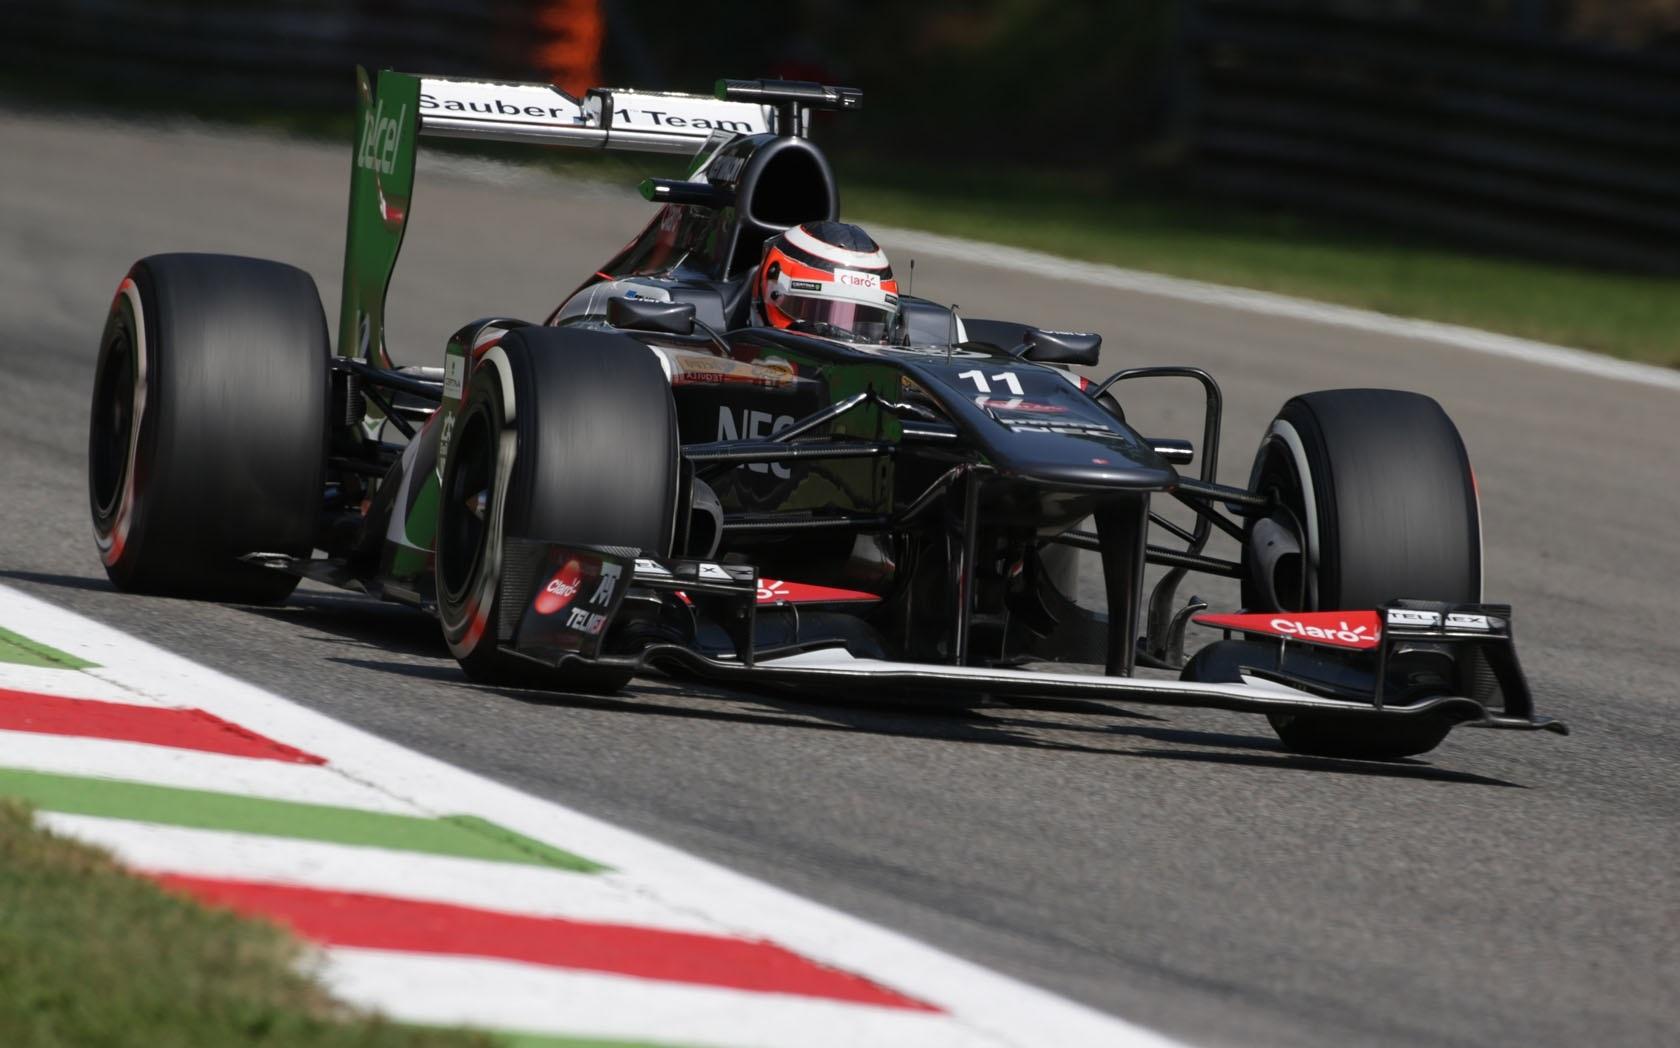 Sauber GP Italia 2013 Nico Hülkenberg